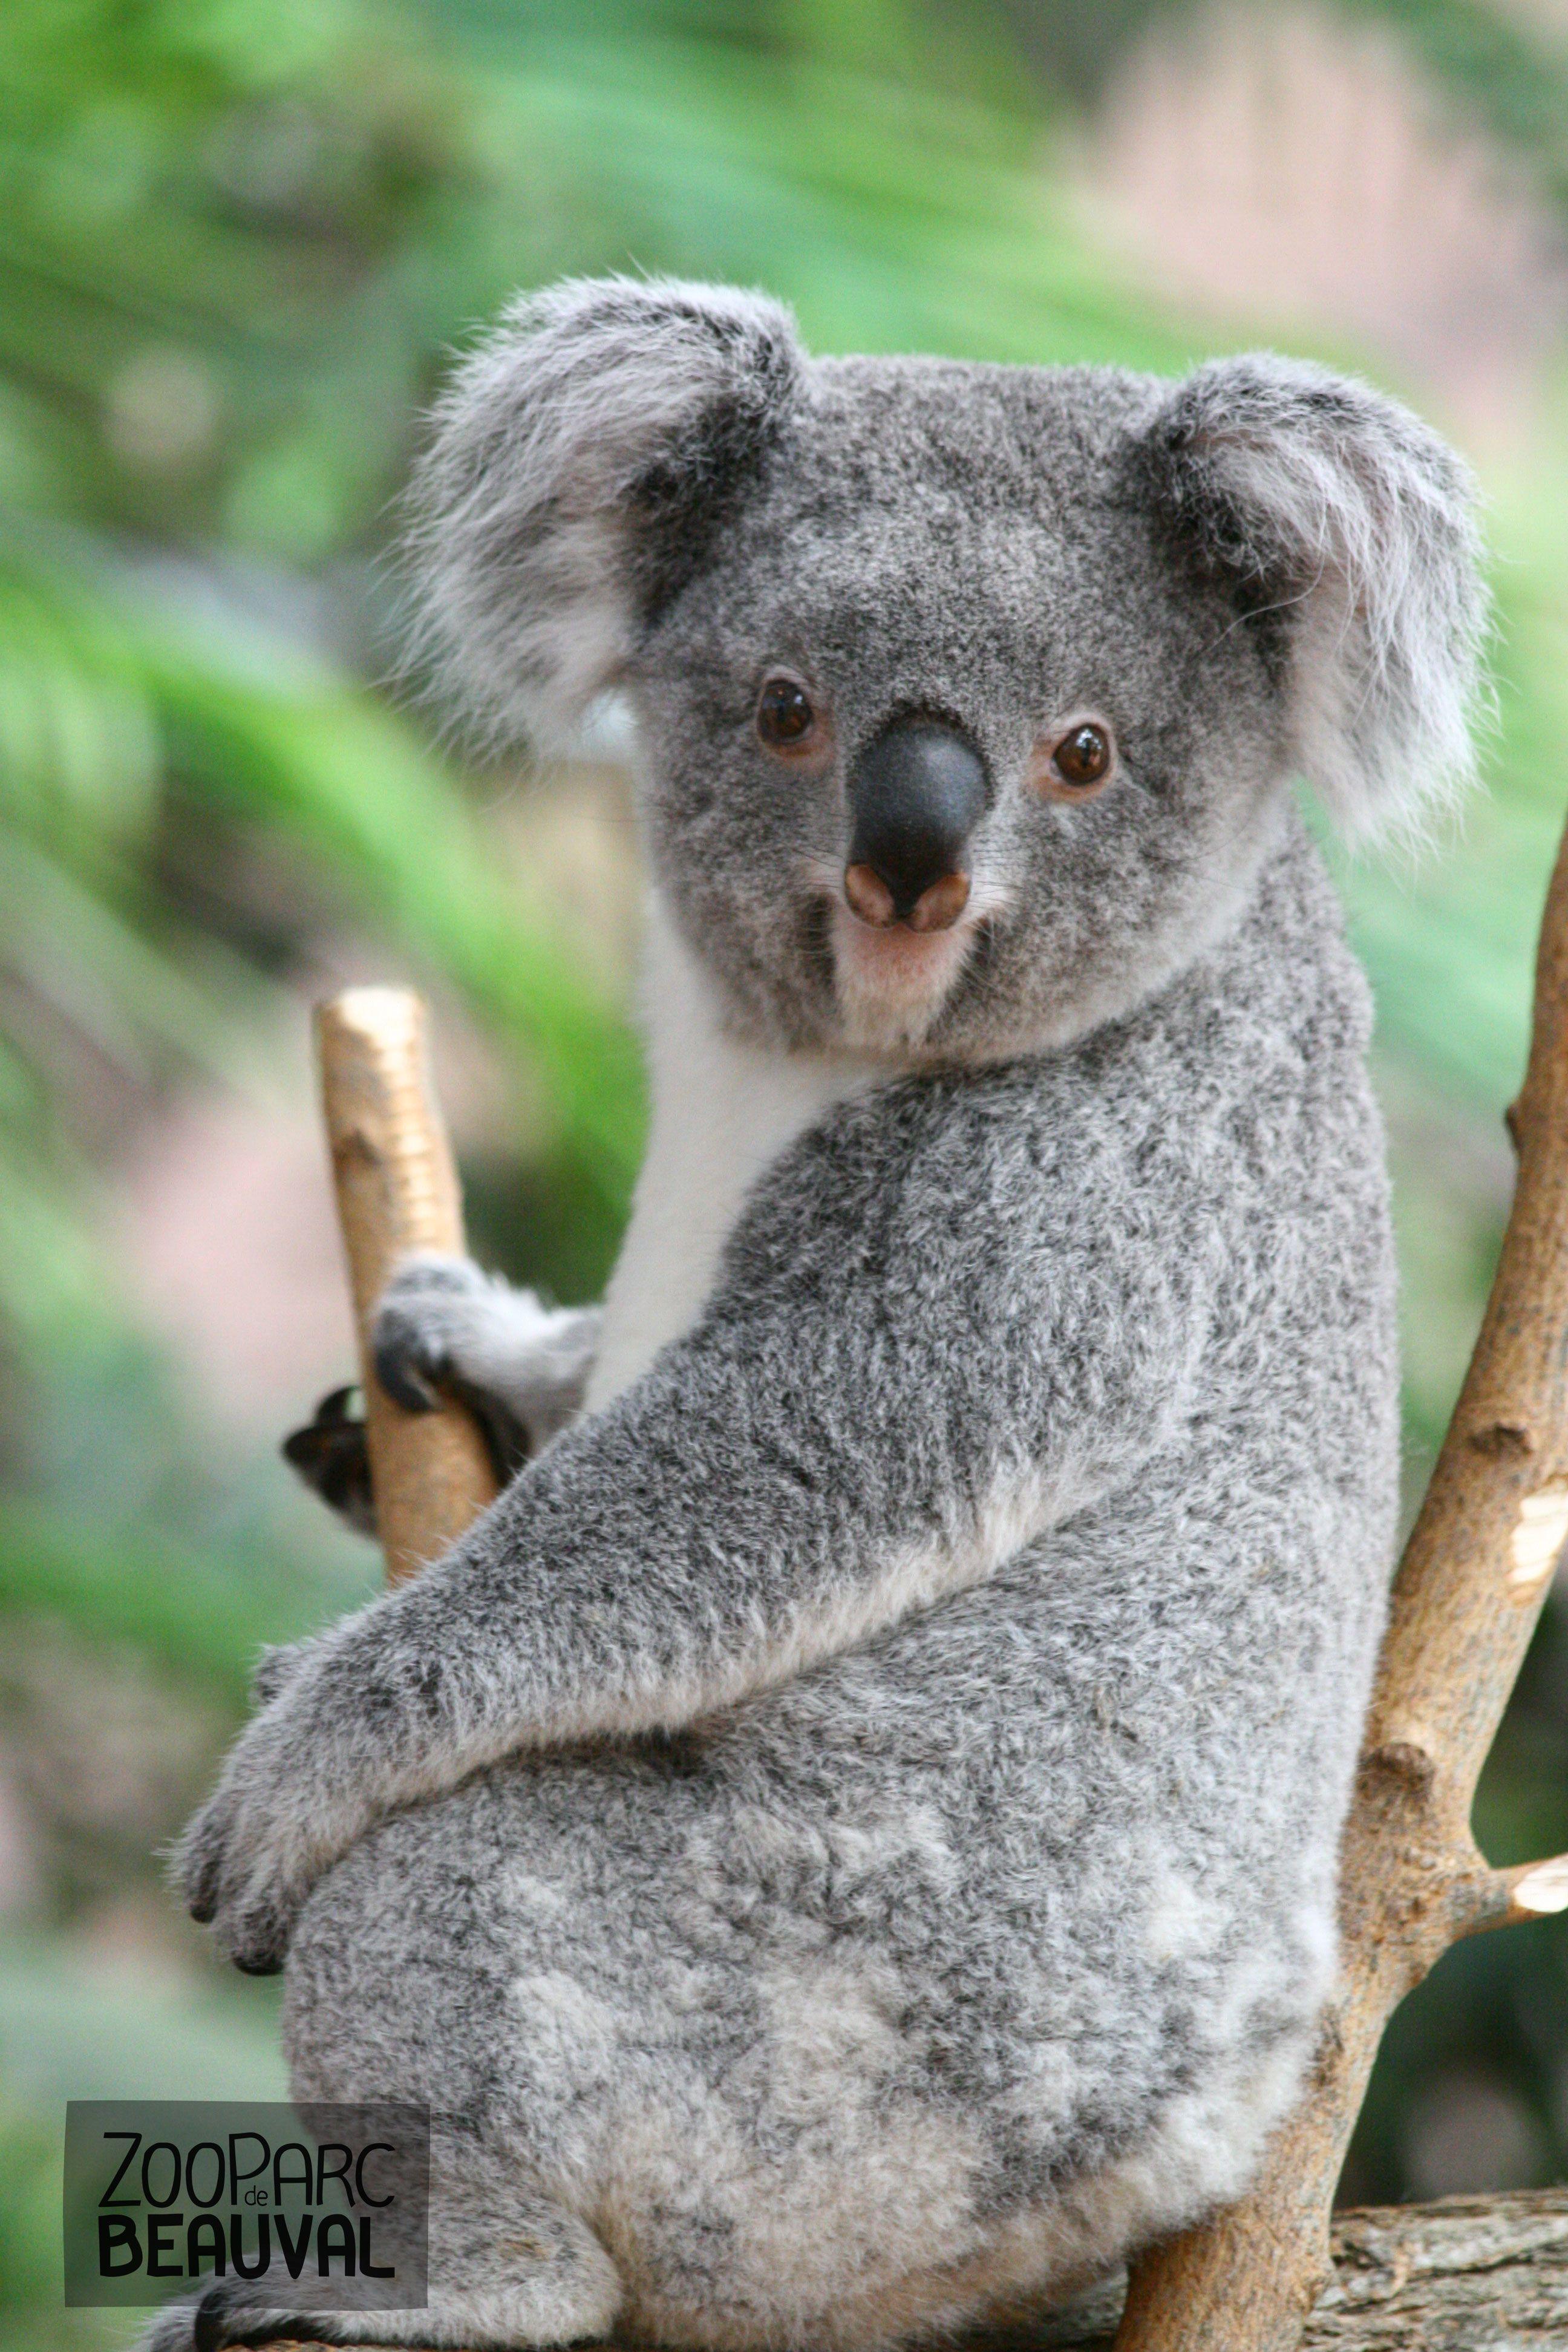 Small Animal Reptiles And Amphibian Habitats: Koala Au ZooParc De Beauval